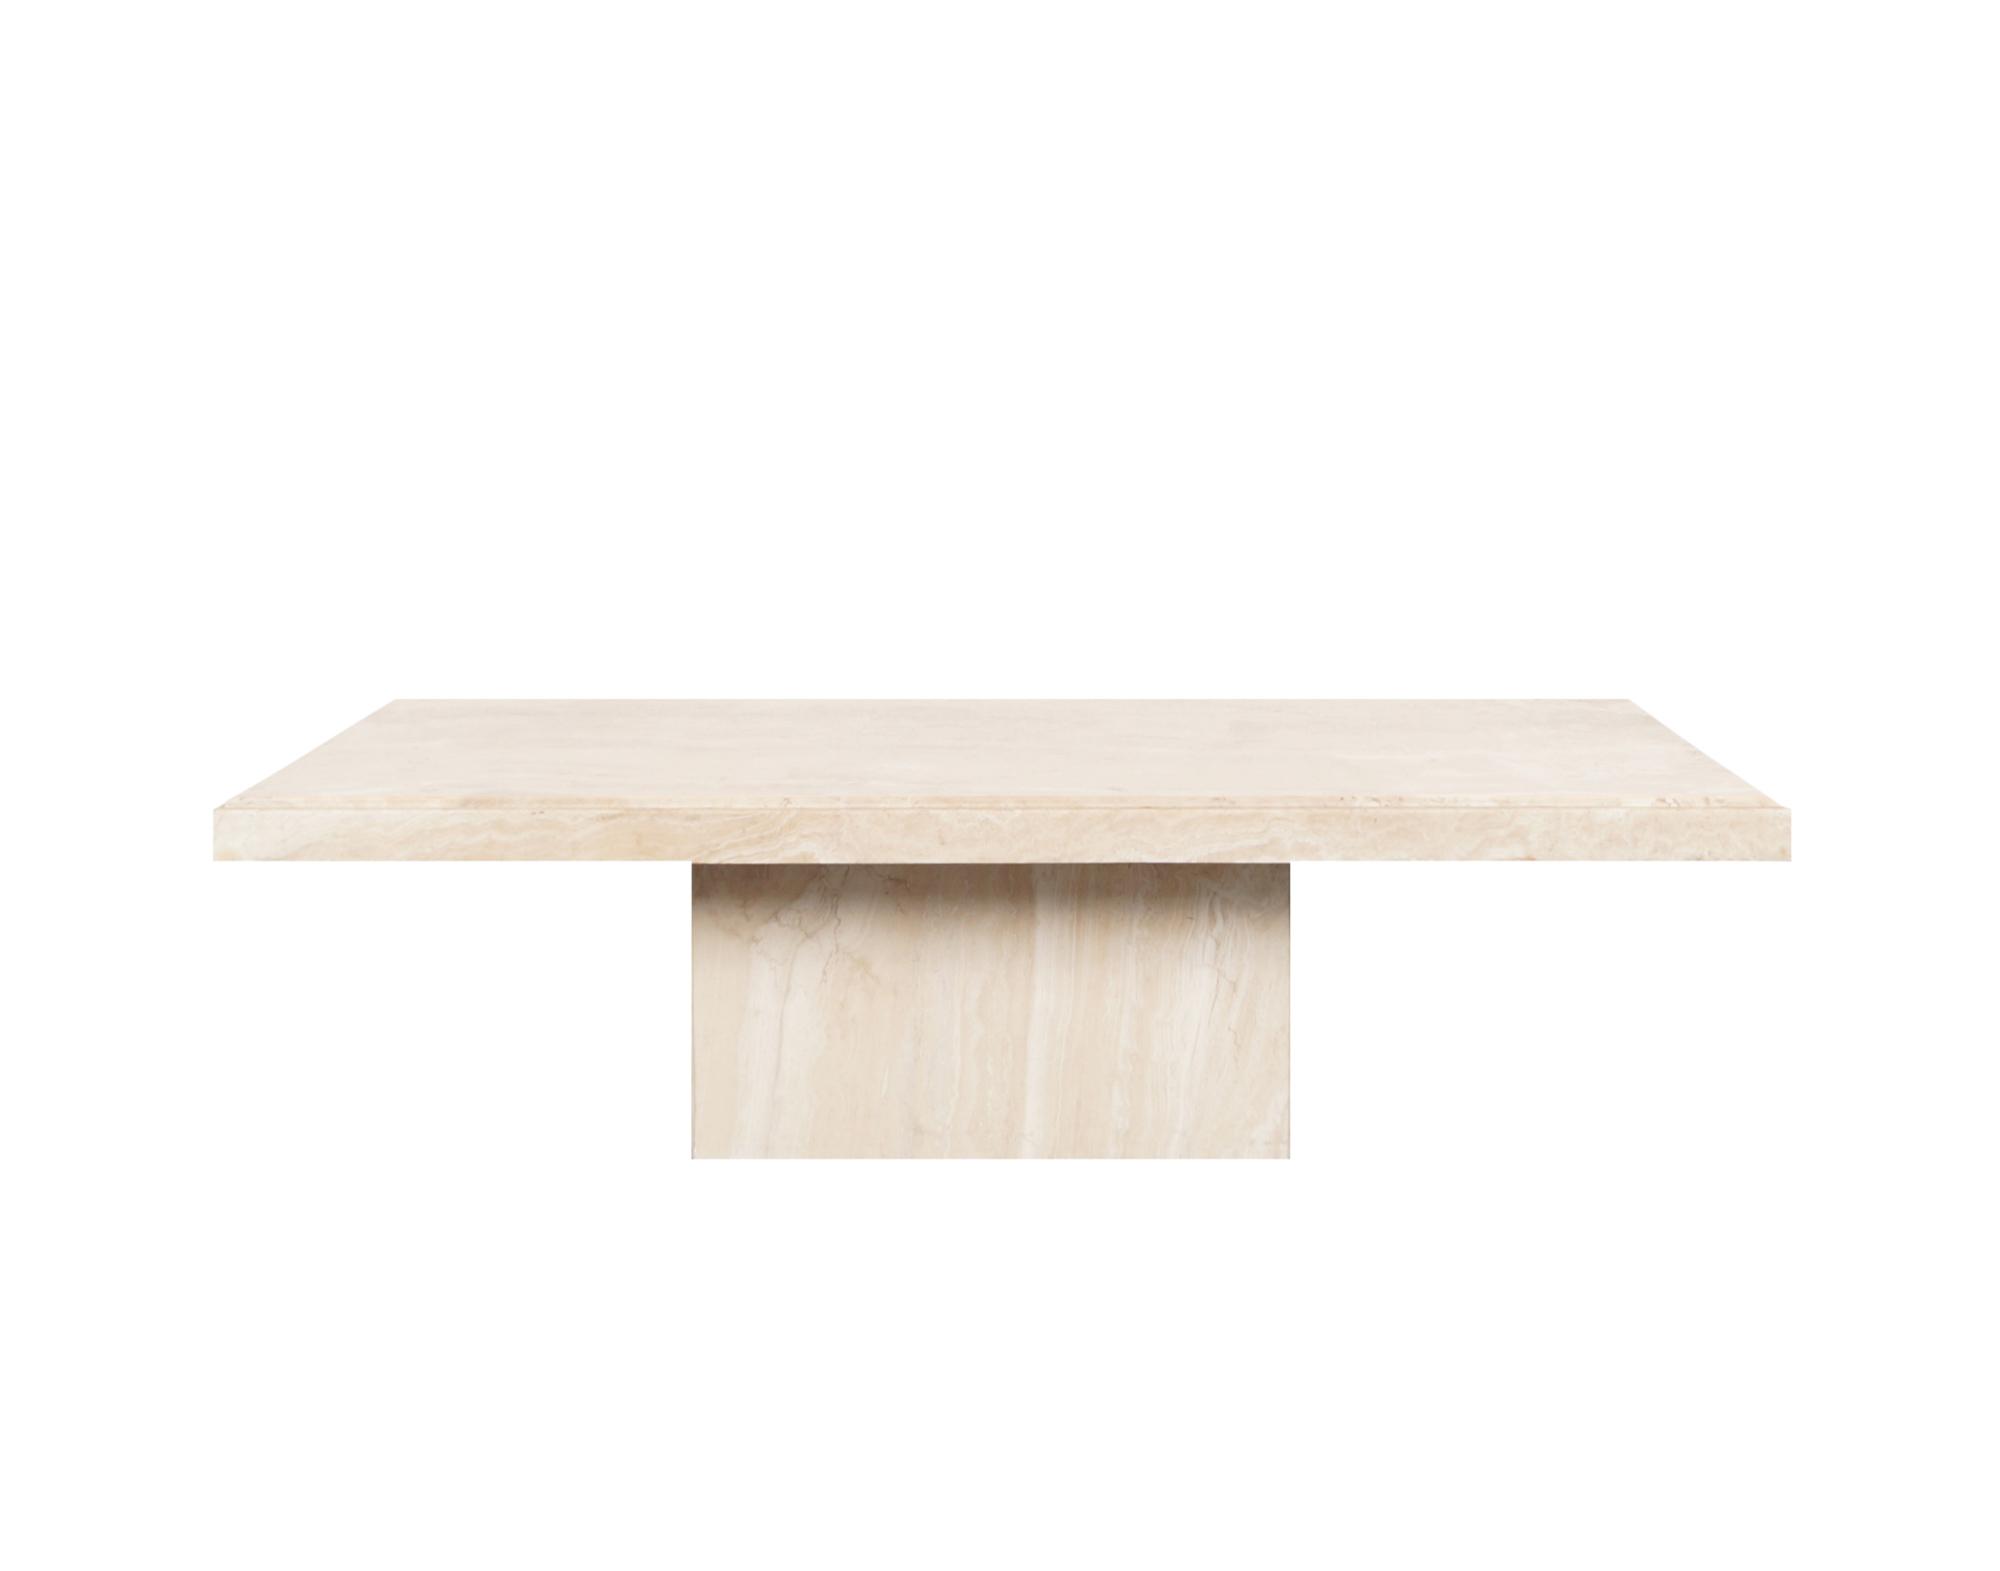 Italian Modernist Travertine Coffee Table